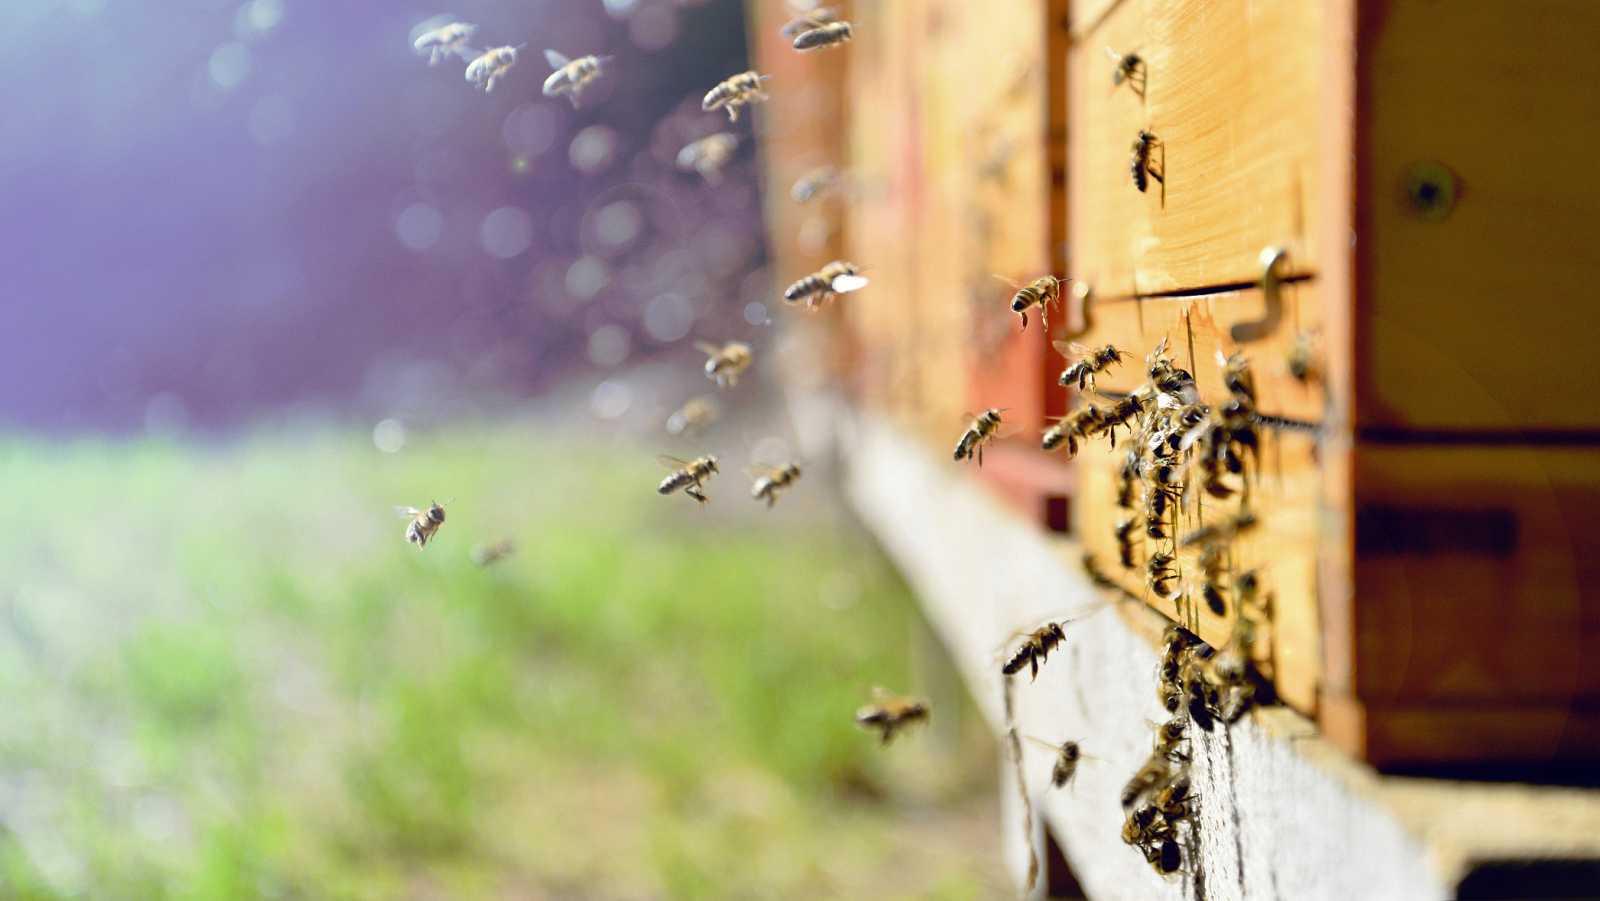 curiosidades sobre las abejas